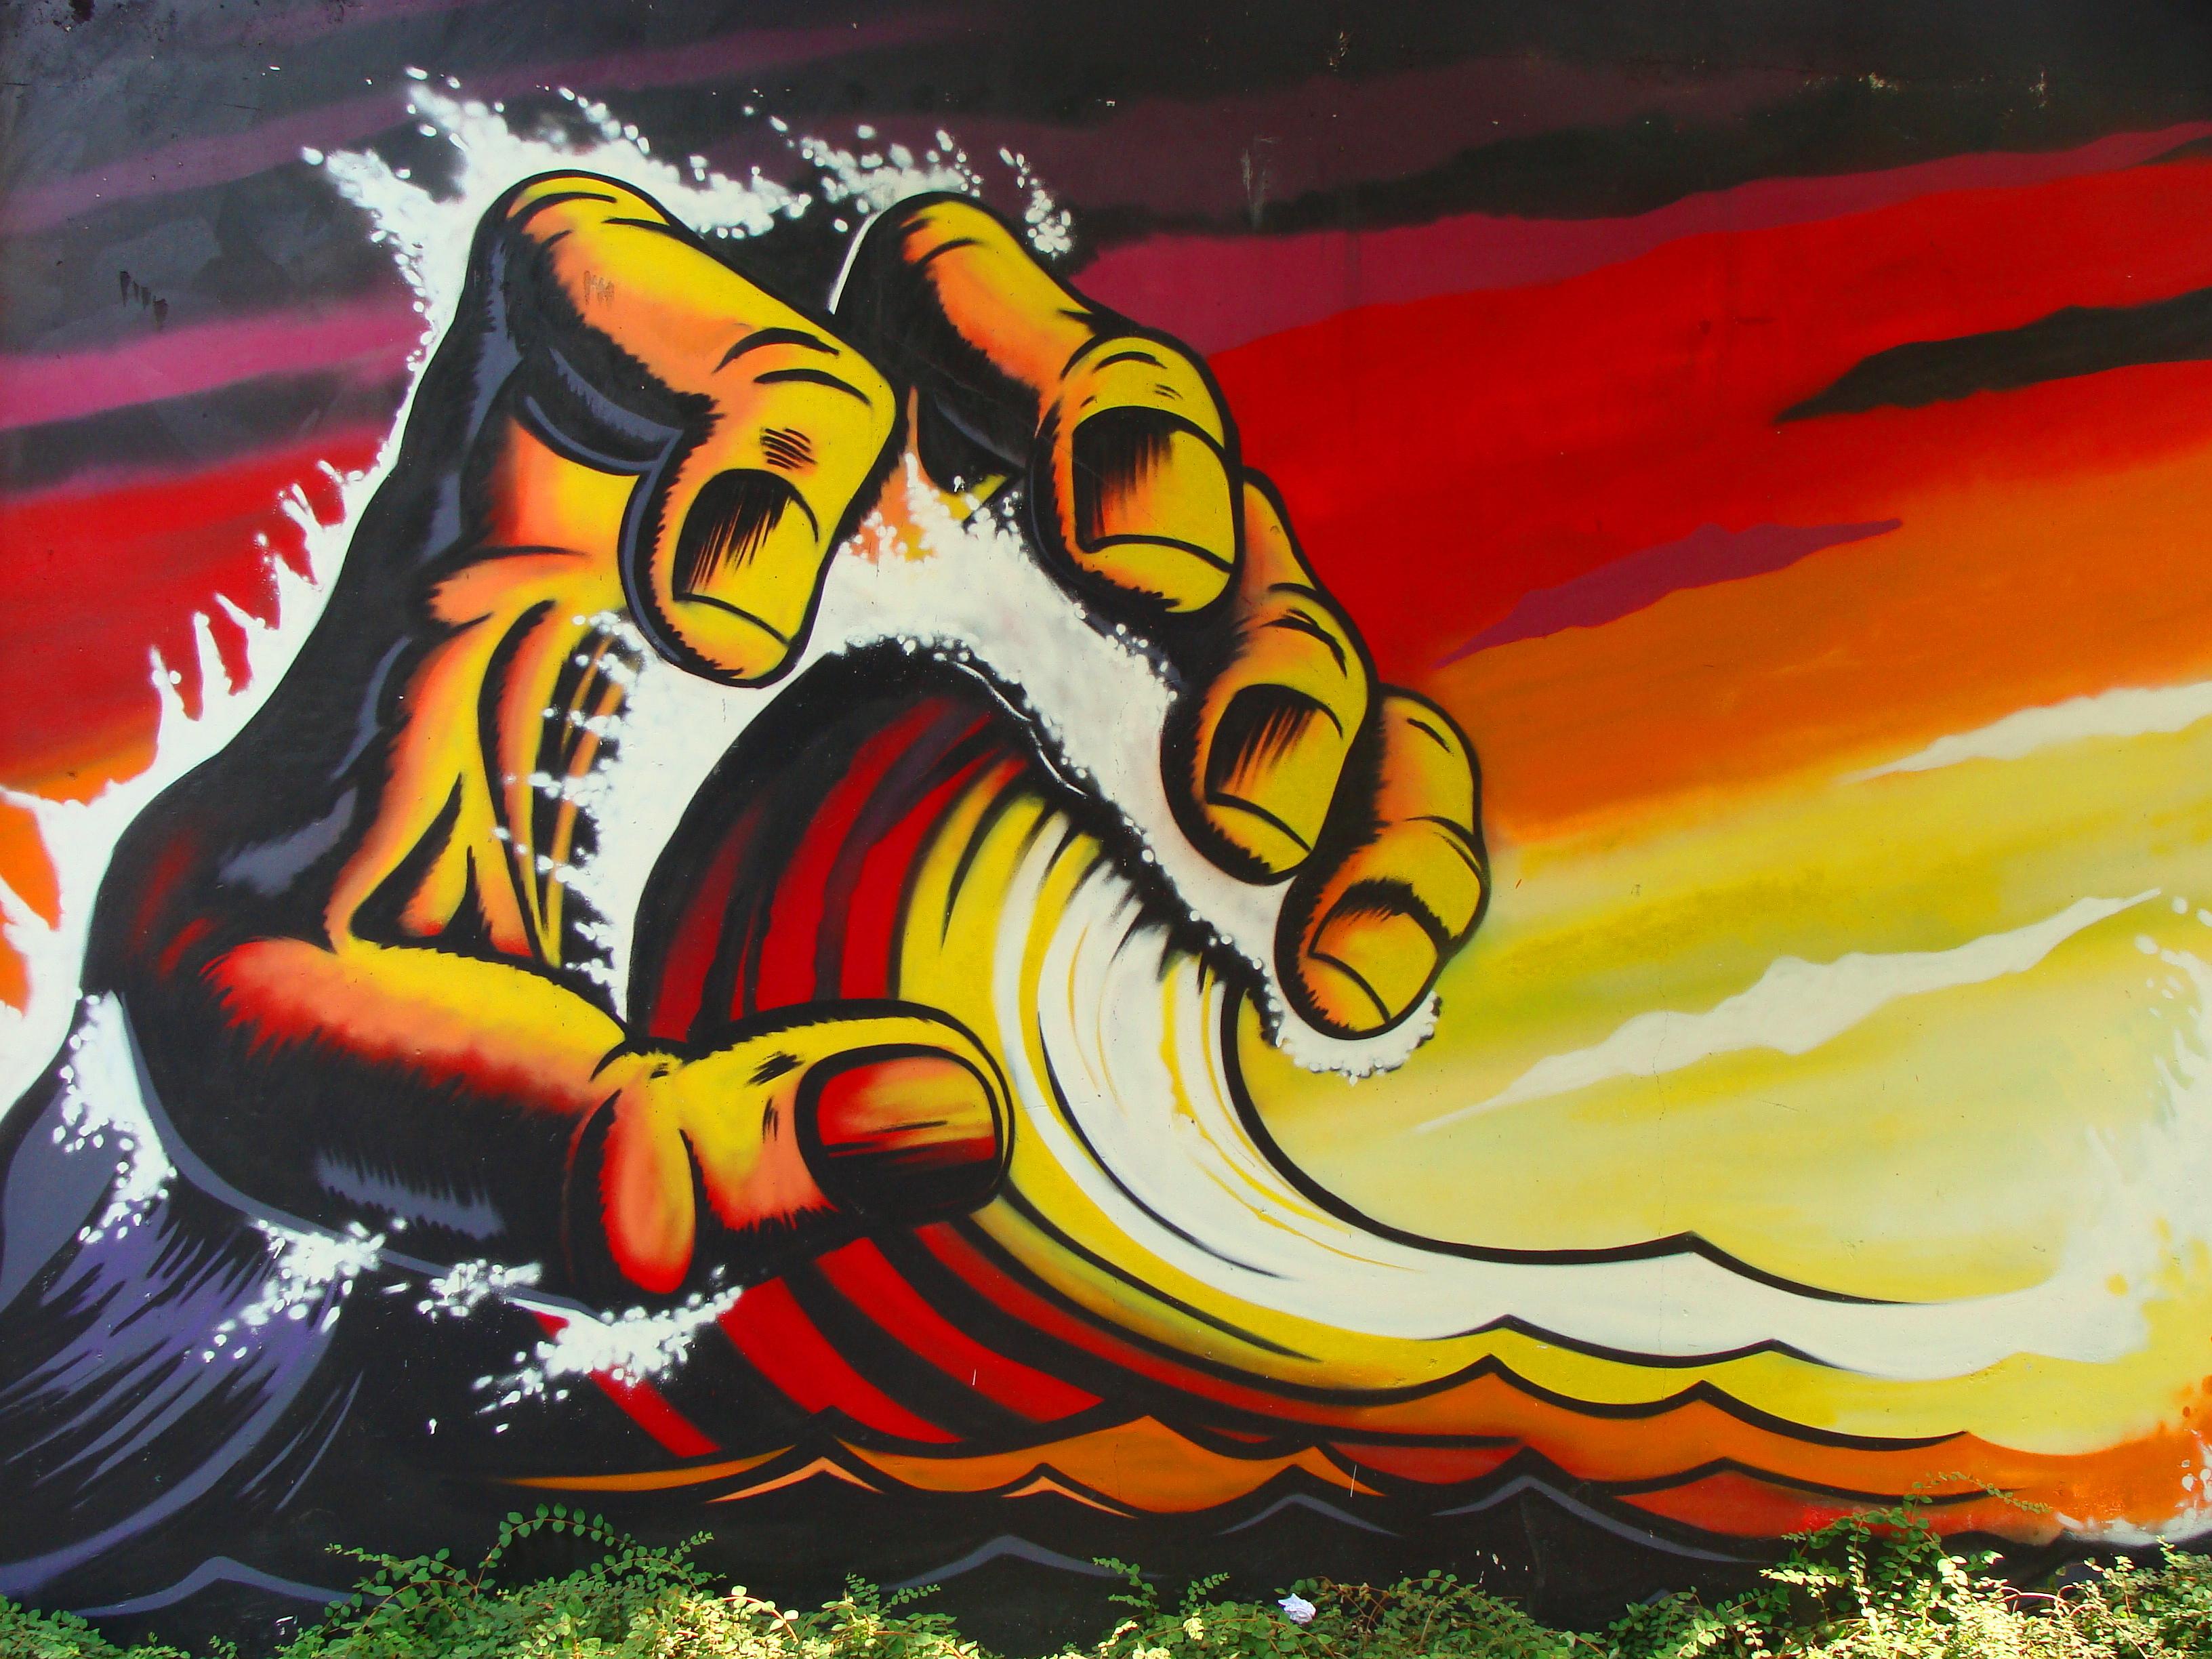 Wallpaper Painting Illustration Italy Artwork Yellow Graffiti